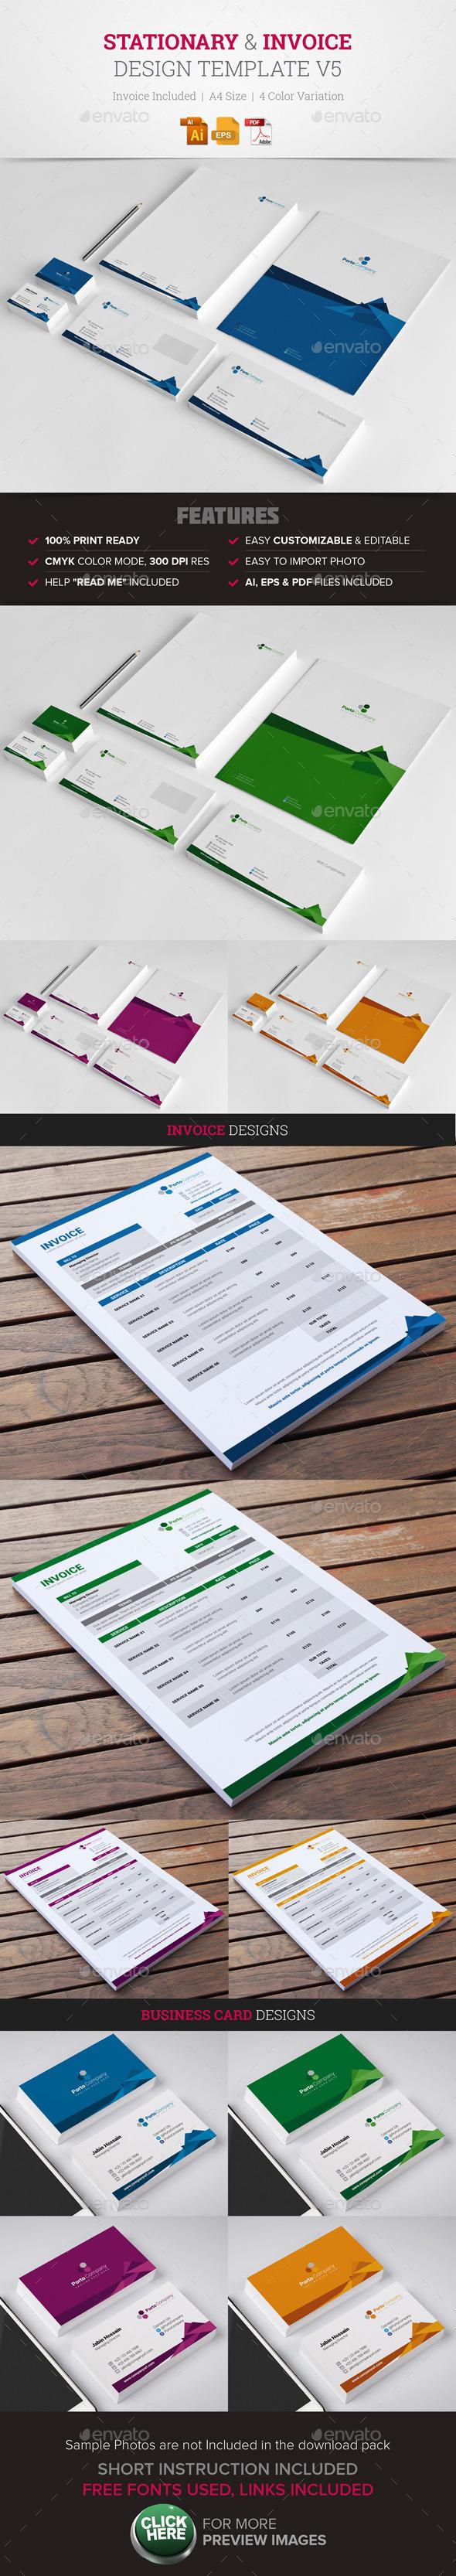 Stationary & Invoice Design Template v5